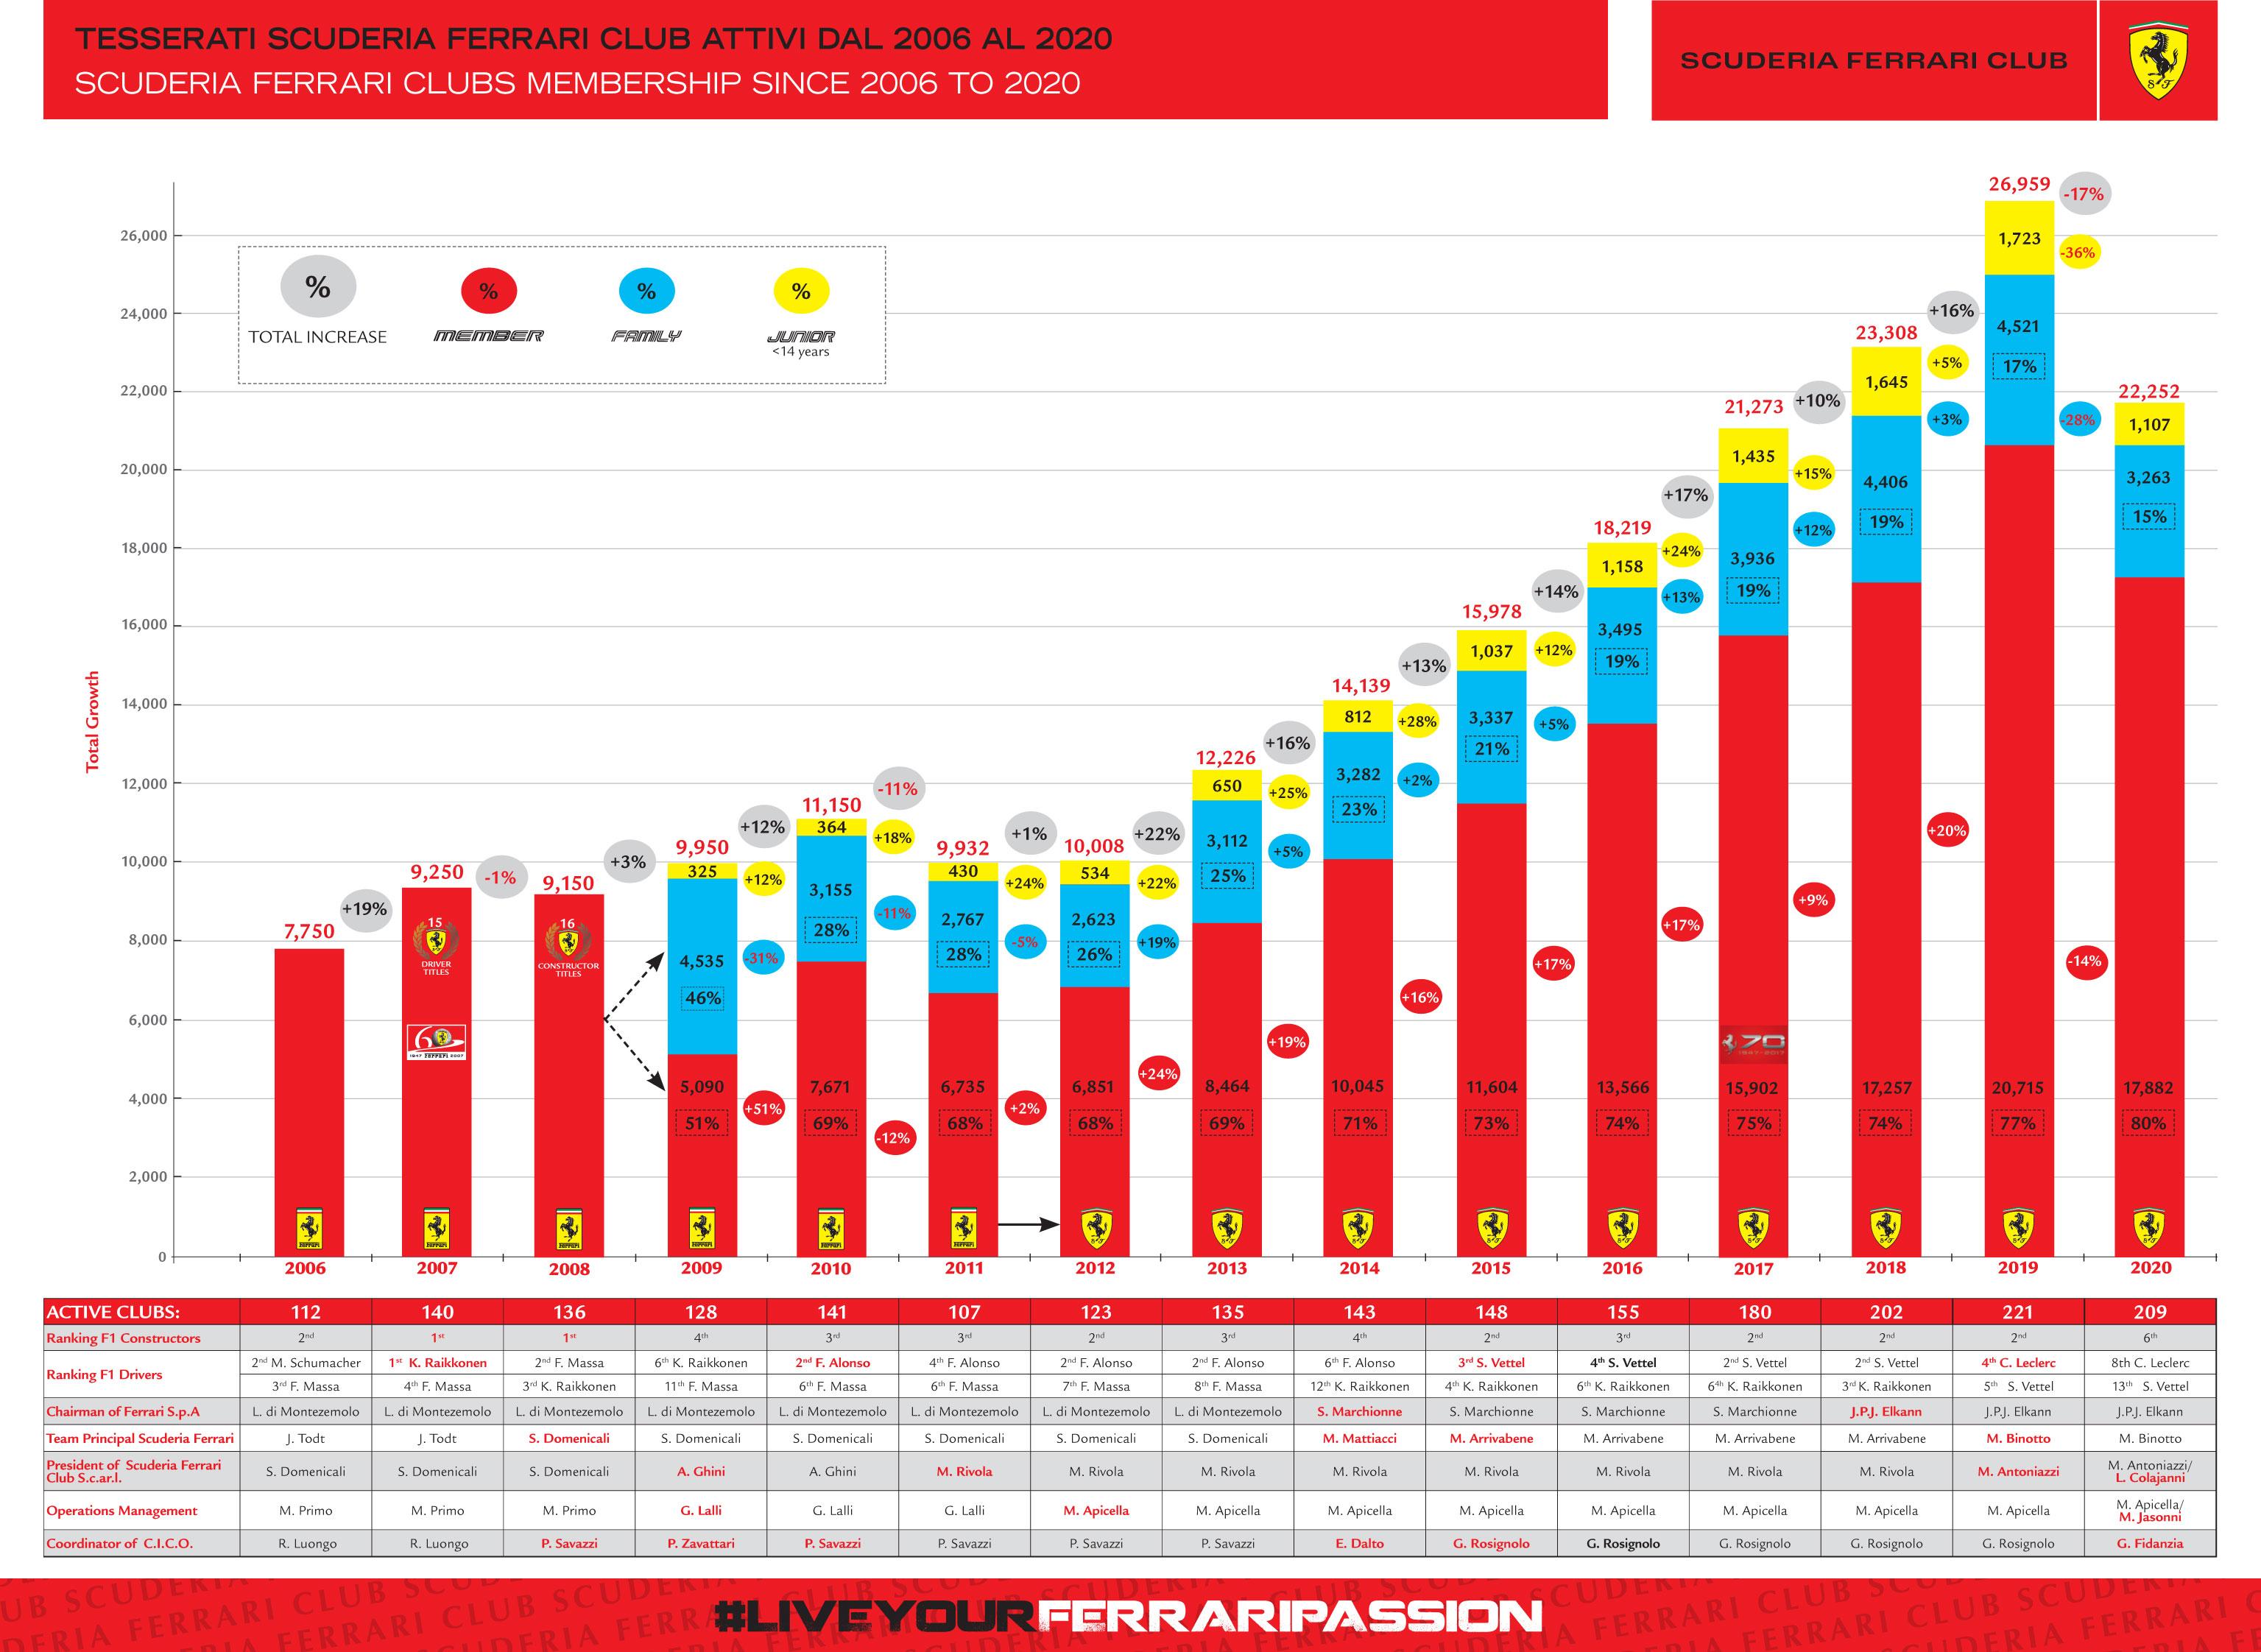 HR_SLIDE-NUMERO-TESSERATI_2006_2020-INTEGRALI-(gennaio-2021)